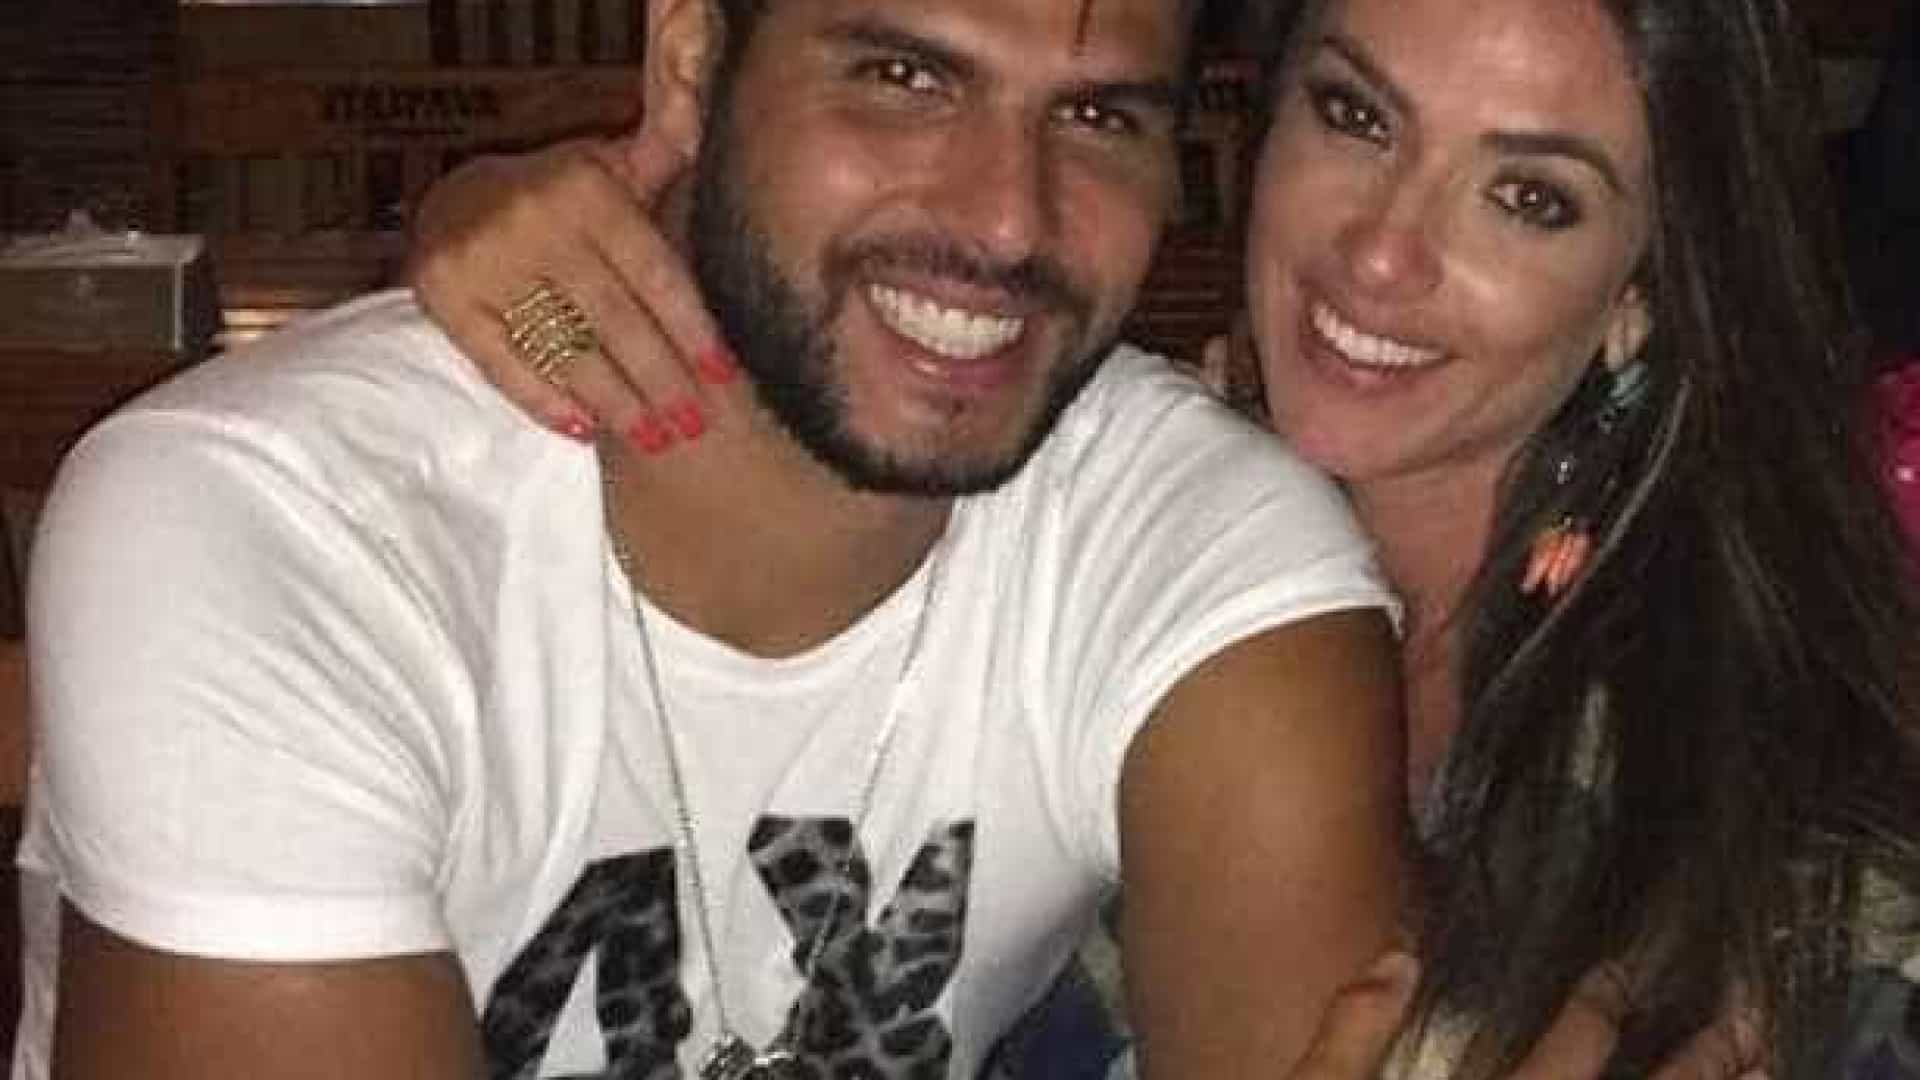 Enzo cellulari e nicole bahls dating